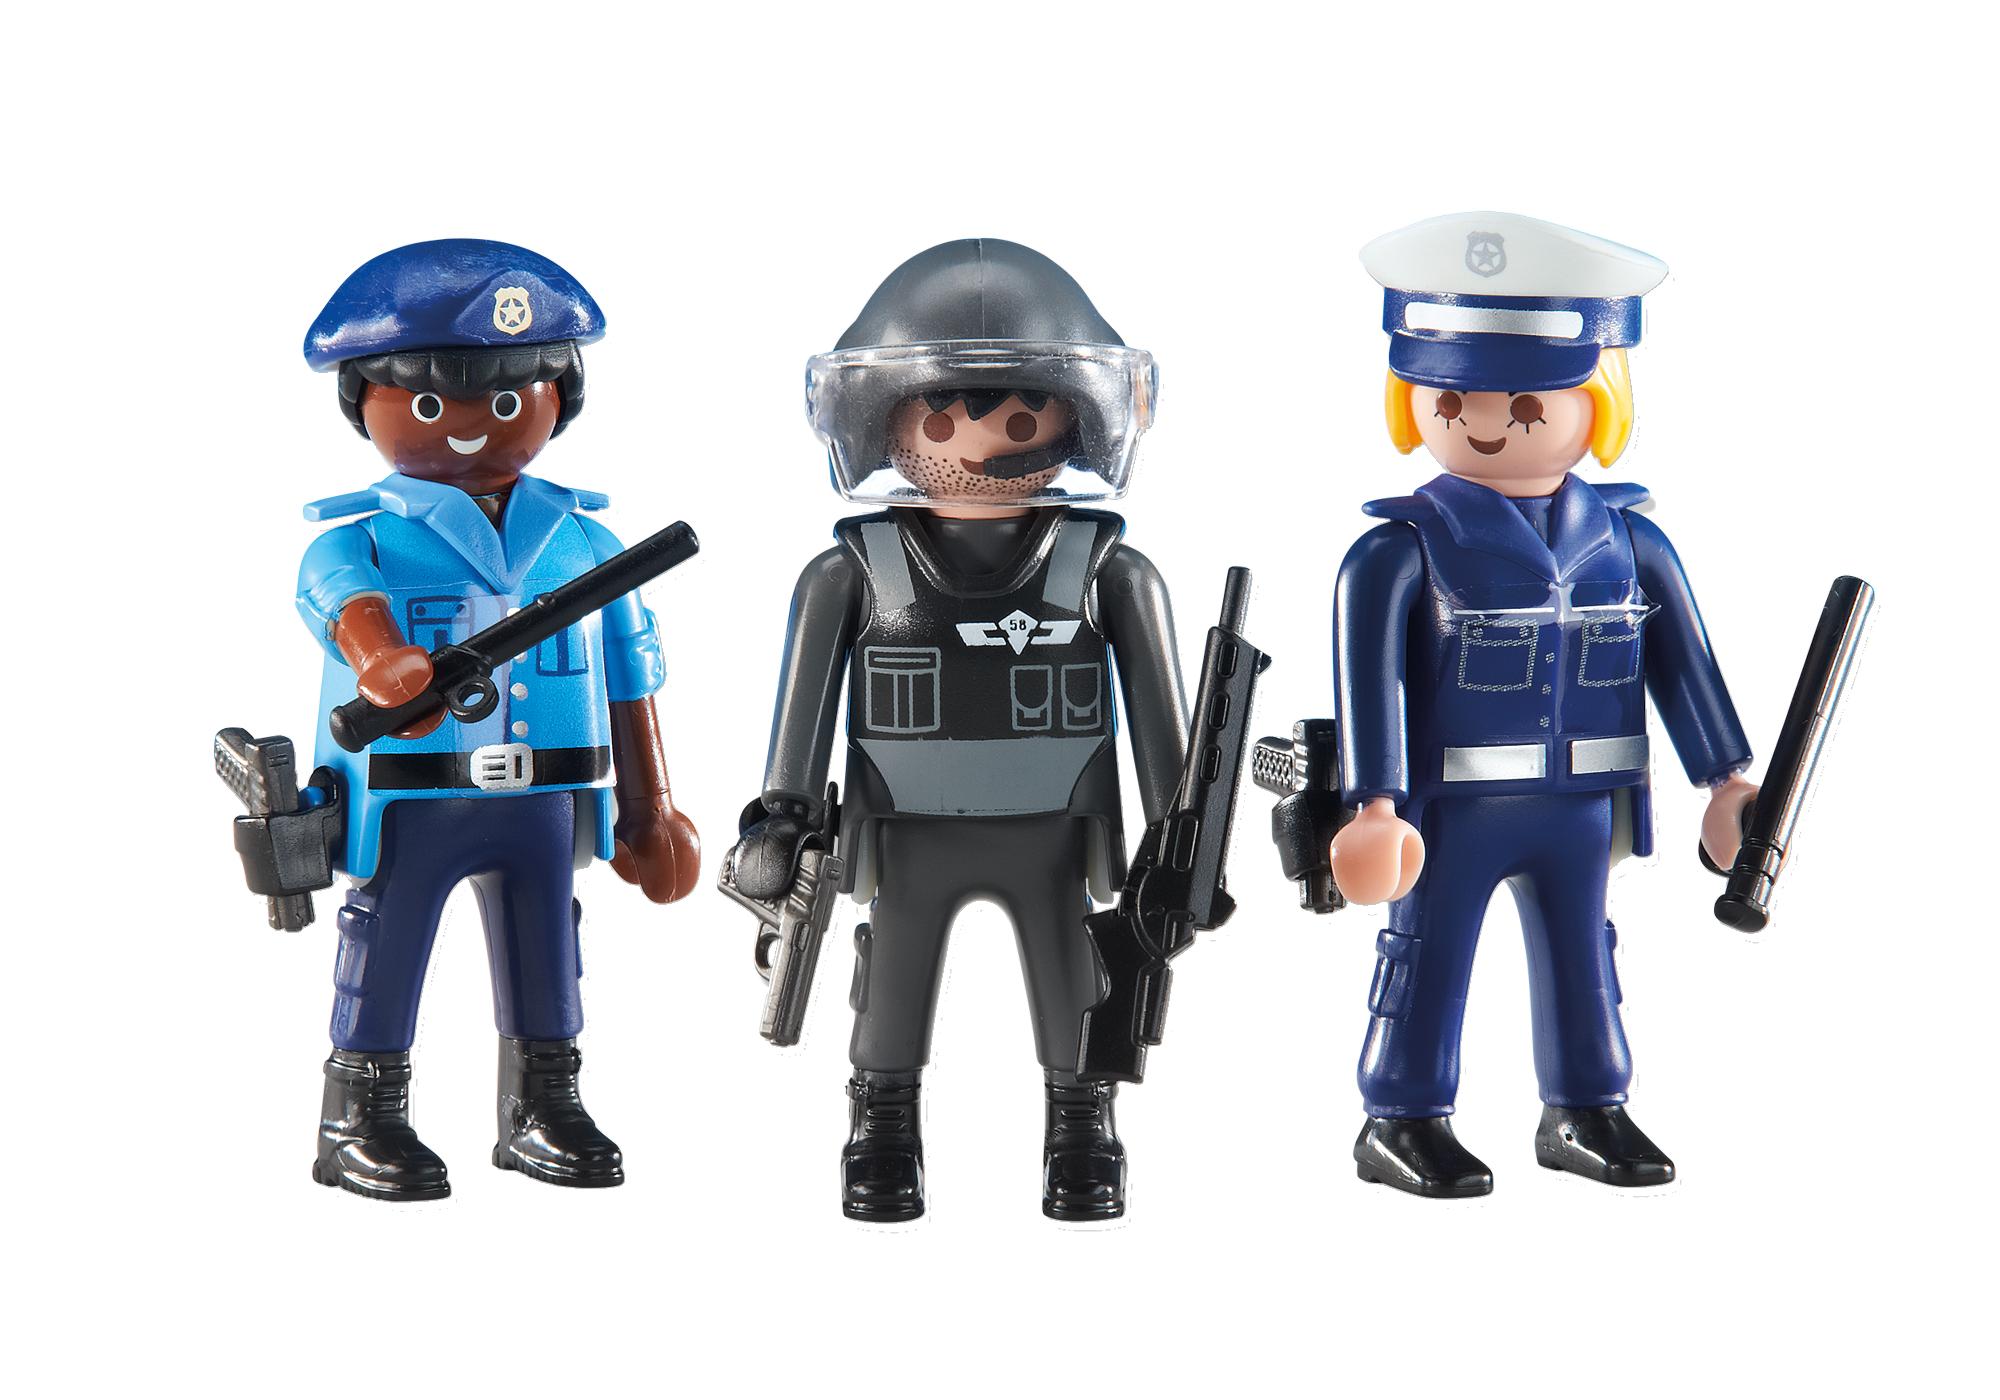 http://media.playmobil.com/i/playmobil/6501_product_detail/3 policiers